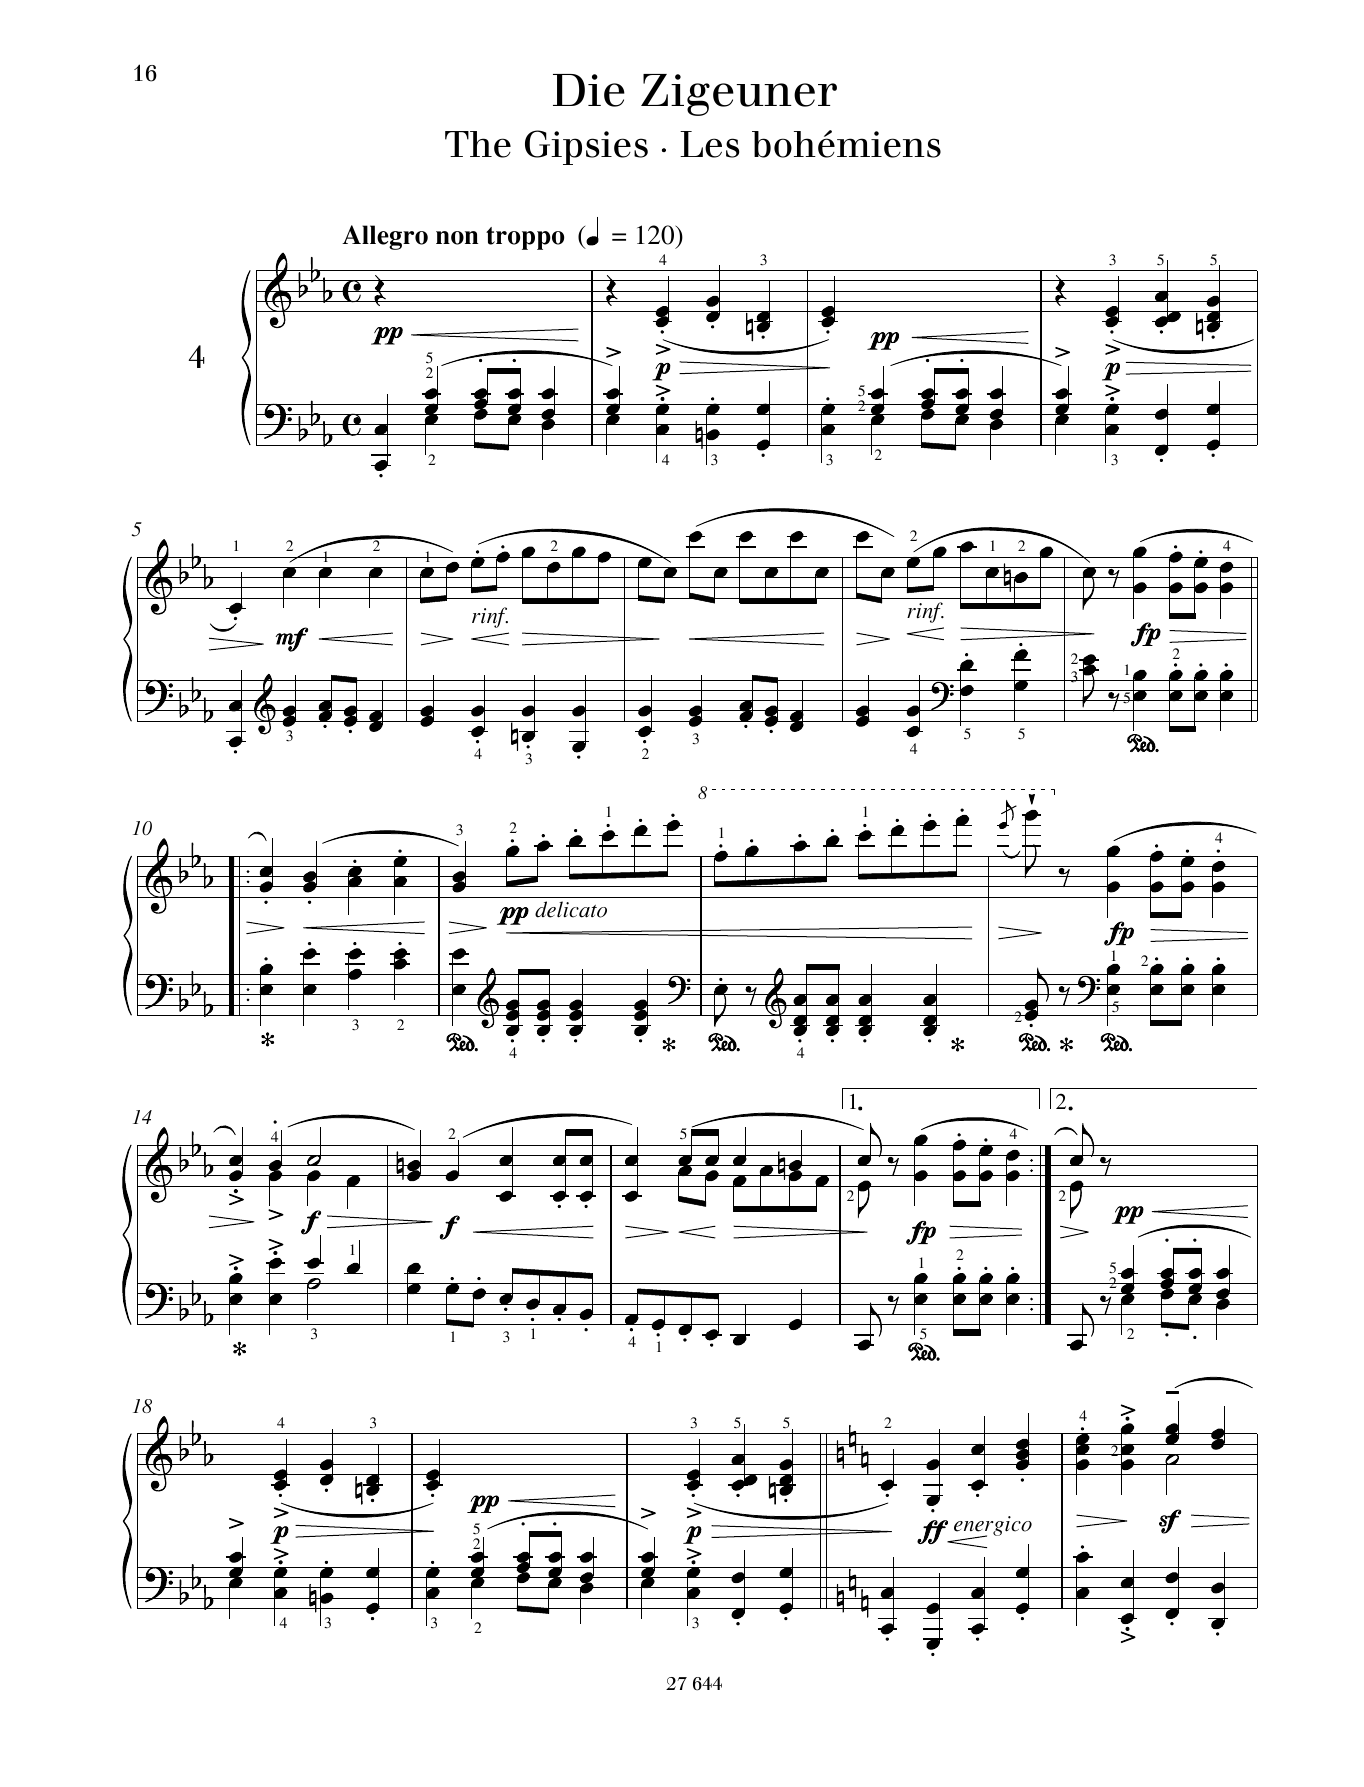 The Gipsies Sheet Music